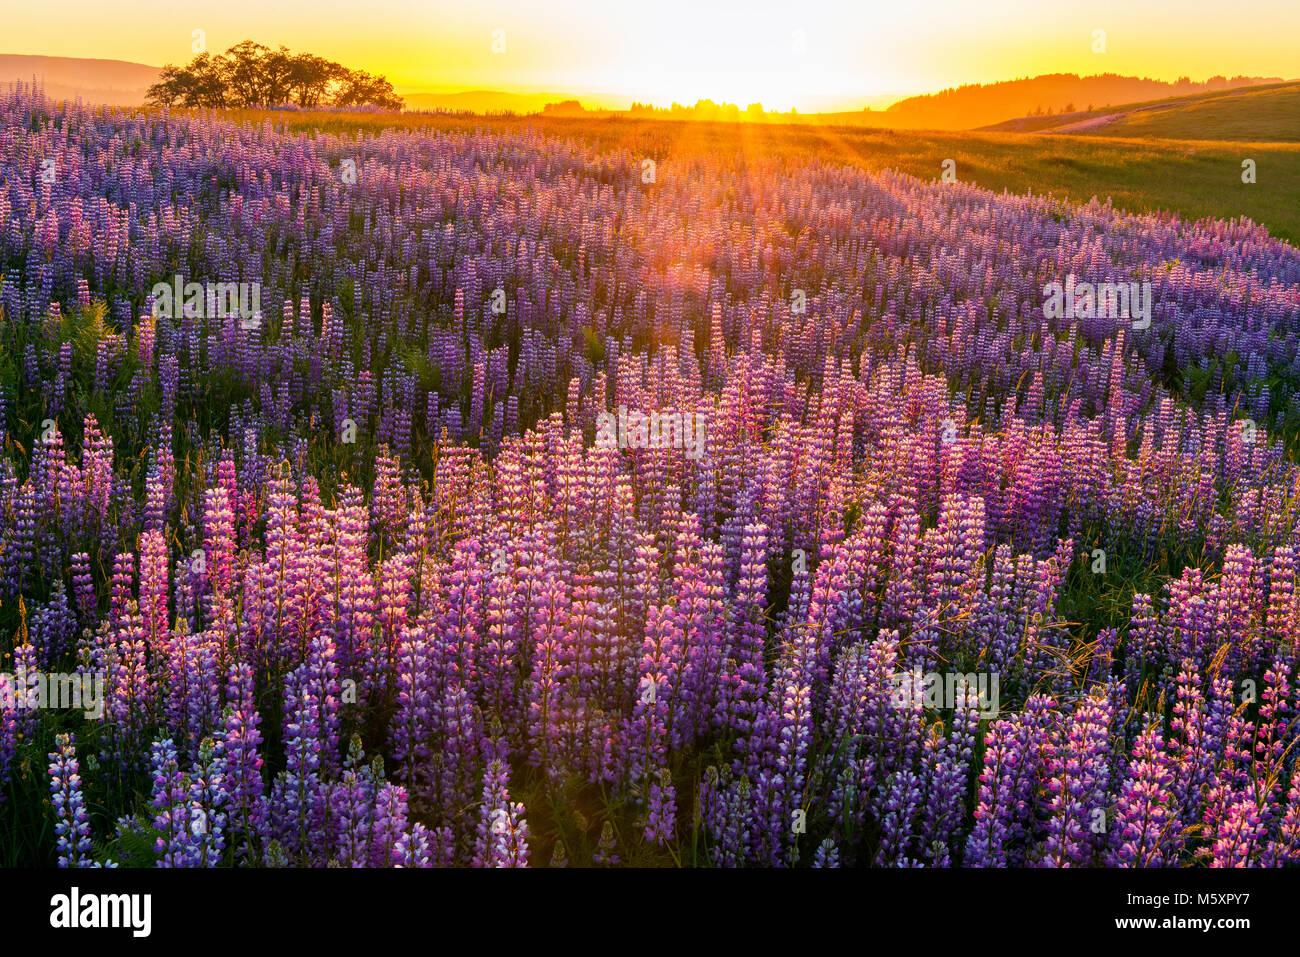 Sunset, Lupin, Lupinus angustifolius, Williams Ridge, Redwood National Park, California - Stock Image